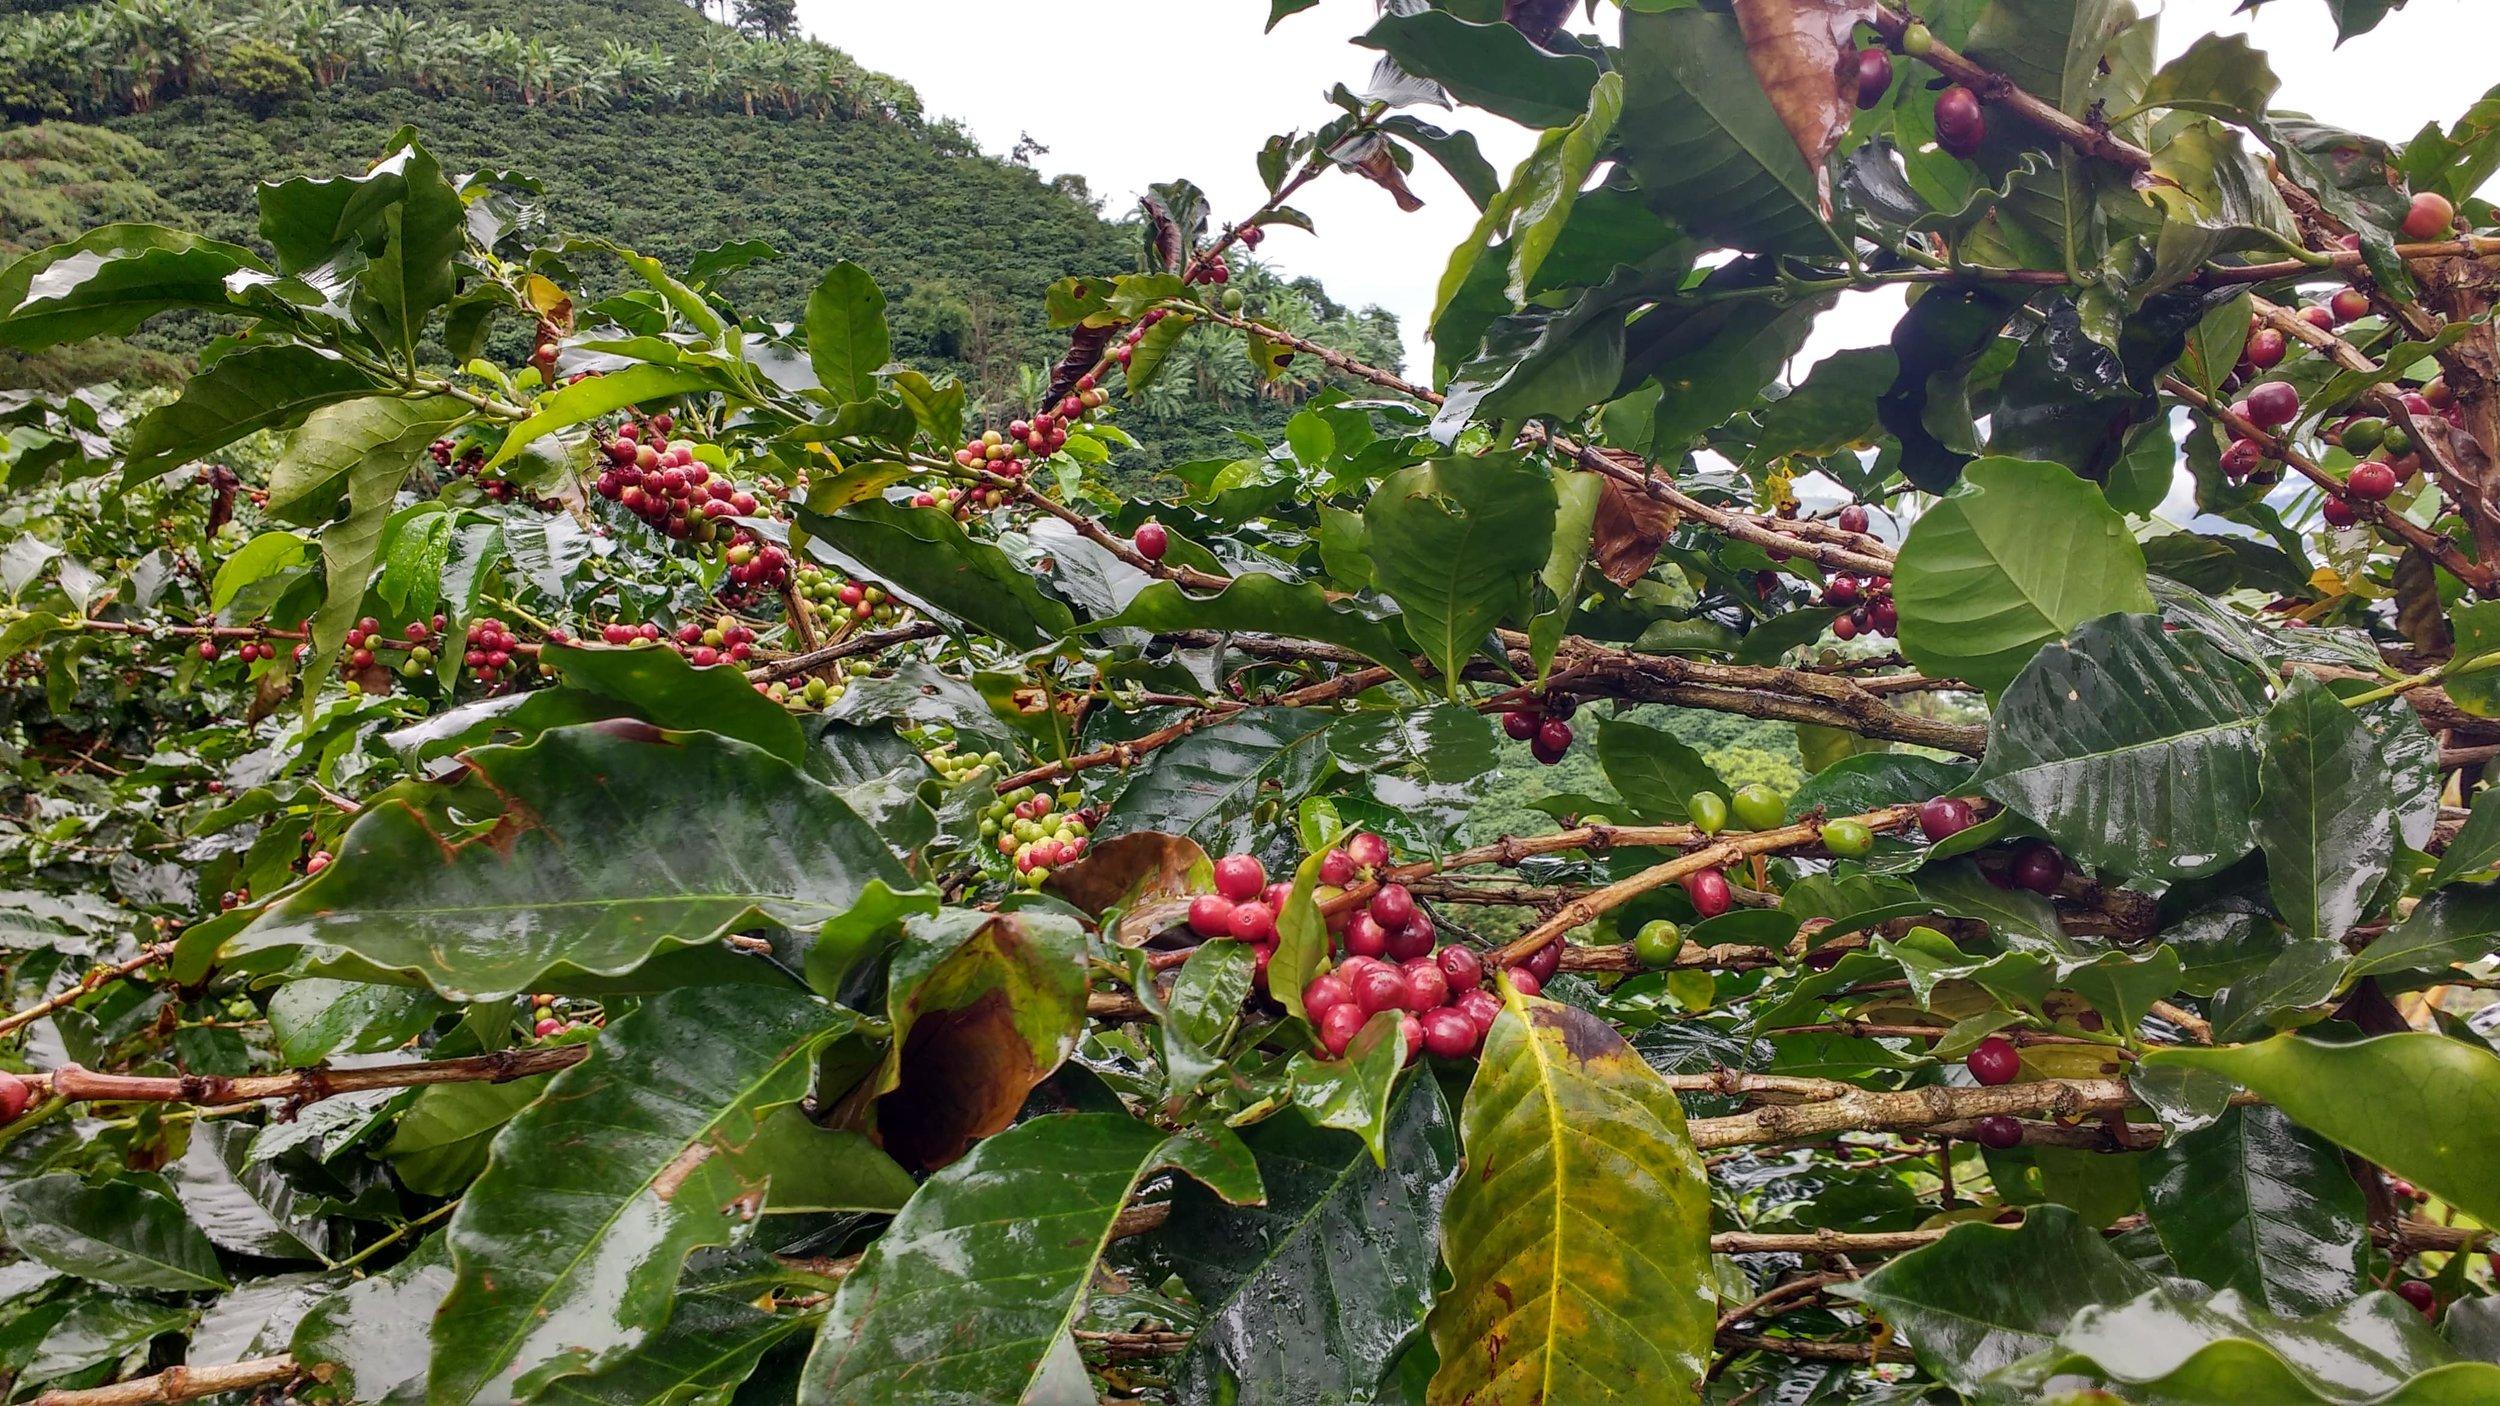 Usda Organic Coffee - AGPROCEM Colombia - Tree of Cherry